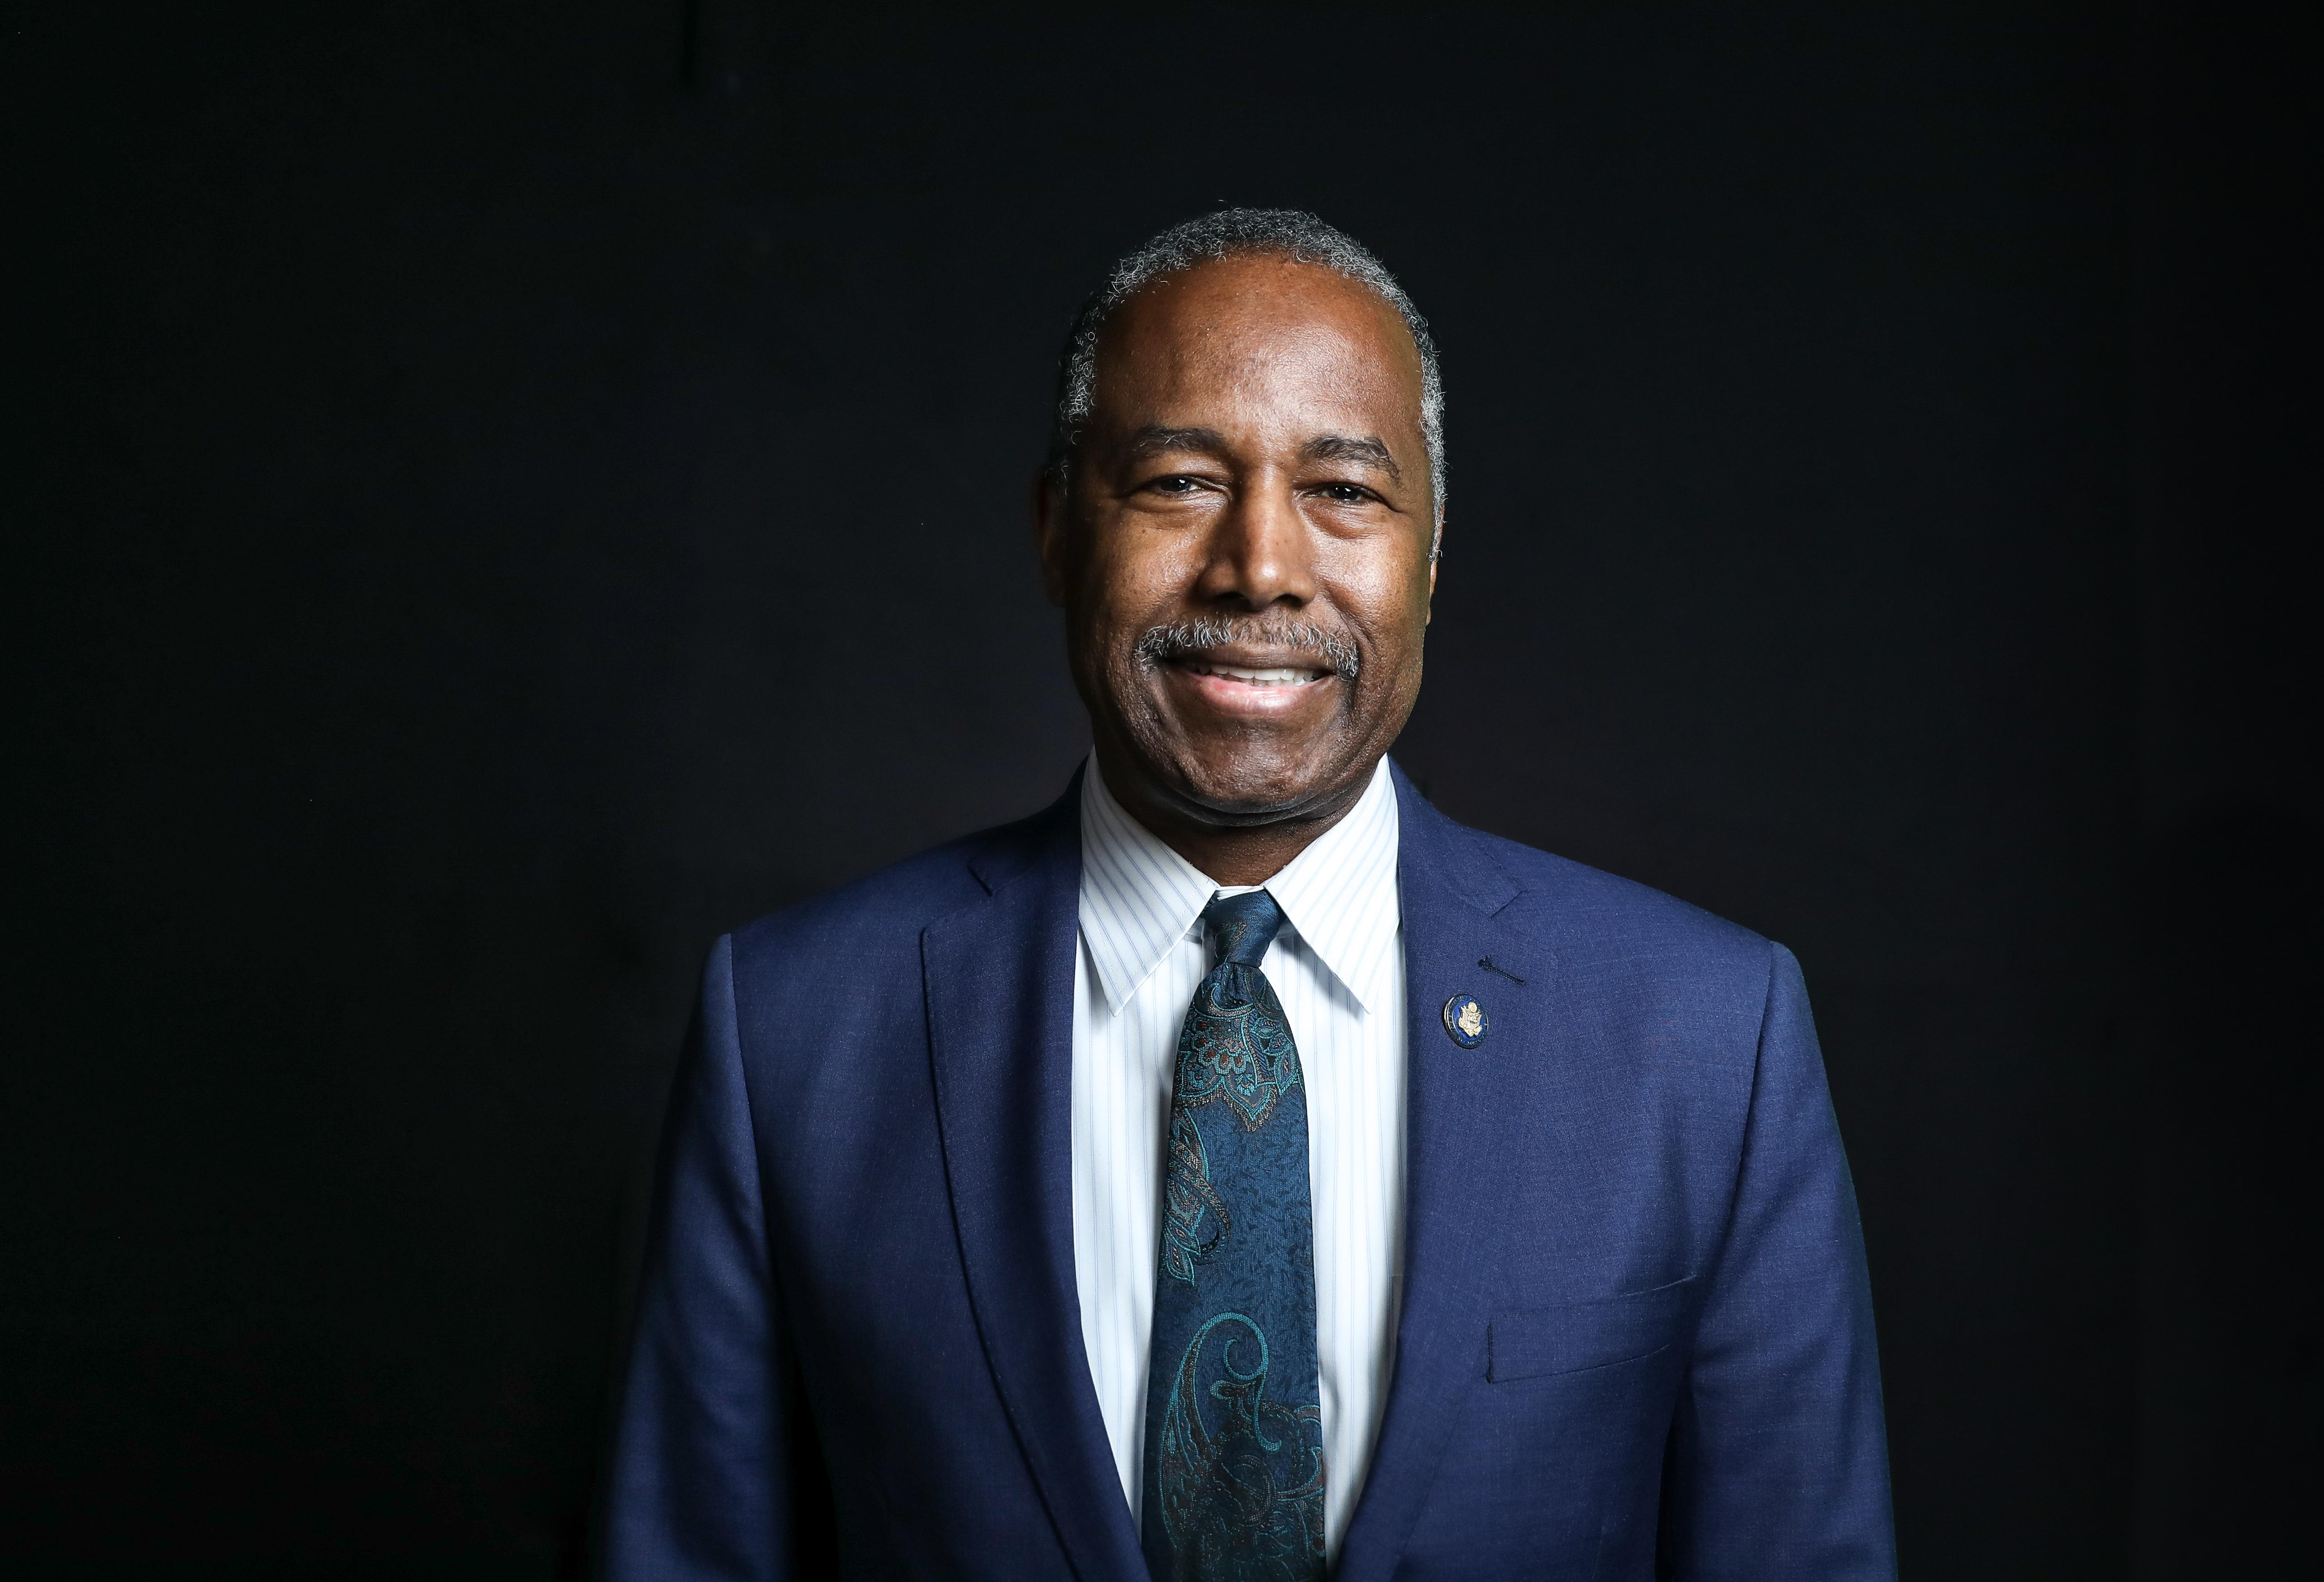 Sec. Ben Carson: On Revitalizing Communities & Ending Foster Youth Homelessness